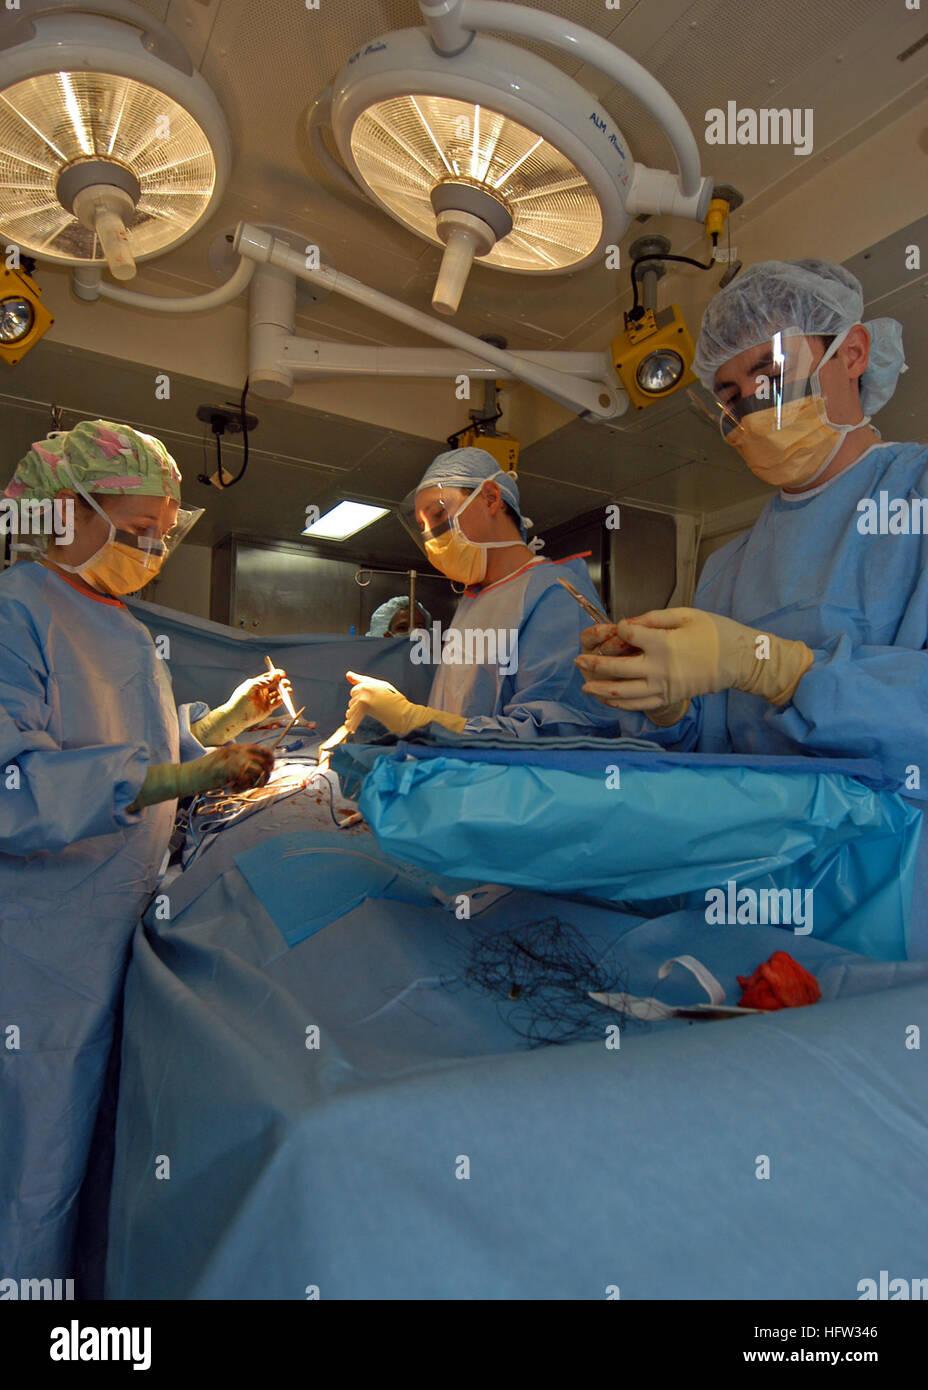 Salle De Bain Oleksiak ~ ships surgery photos ships surgery images alamy